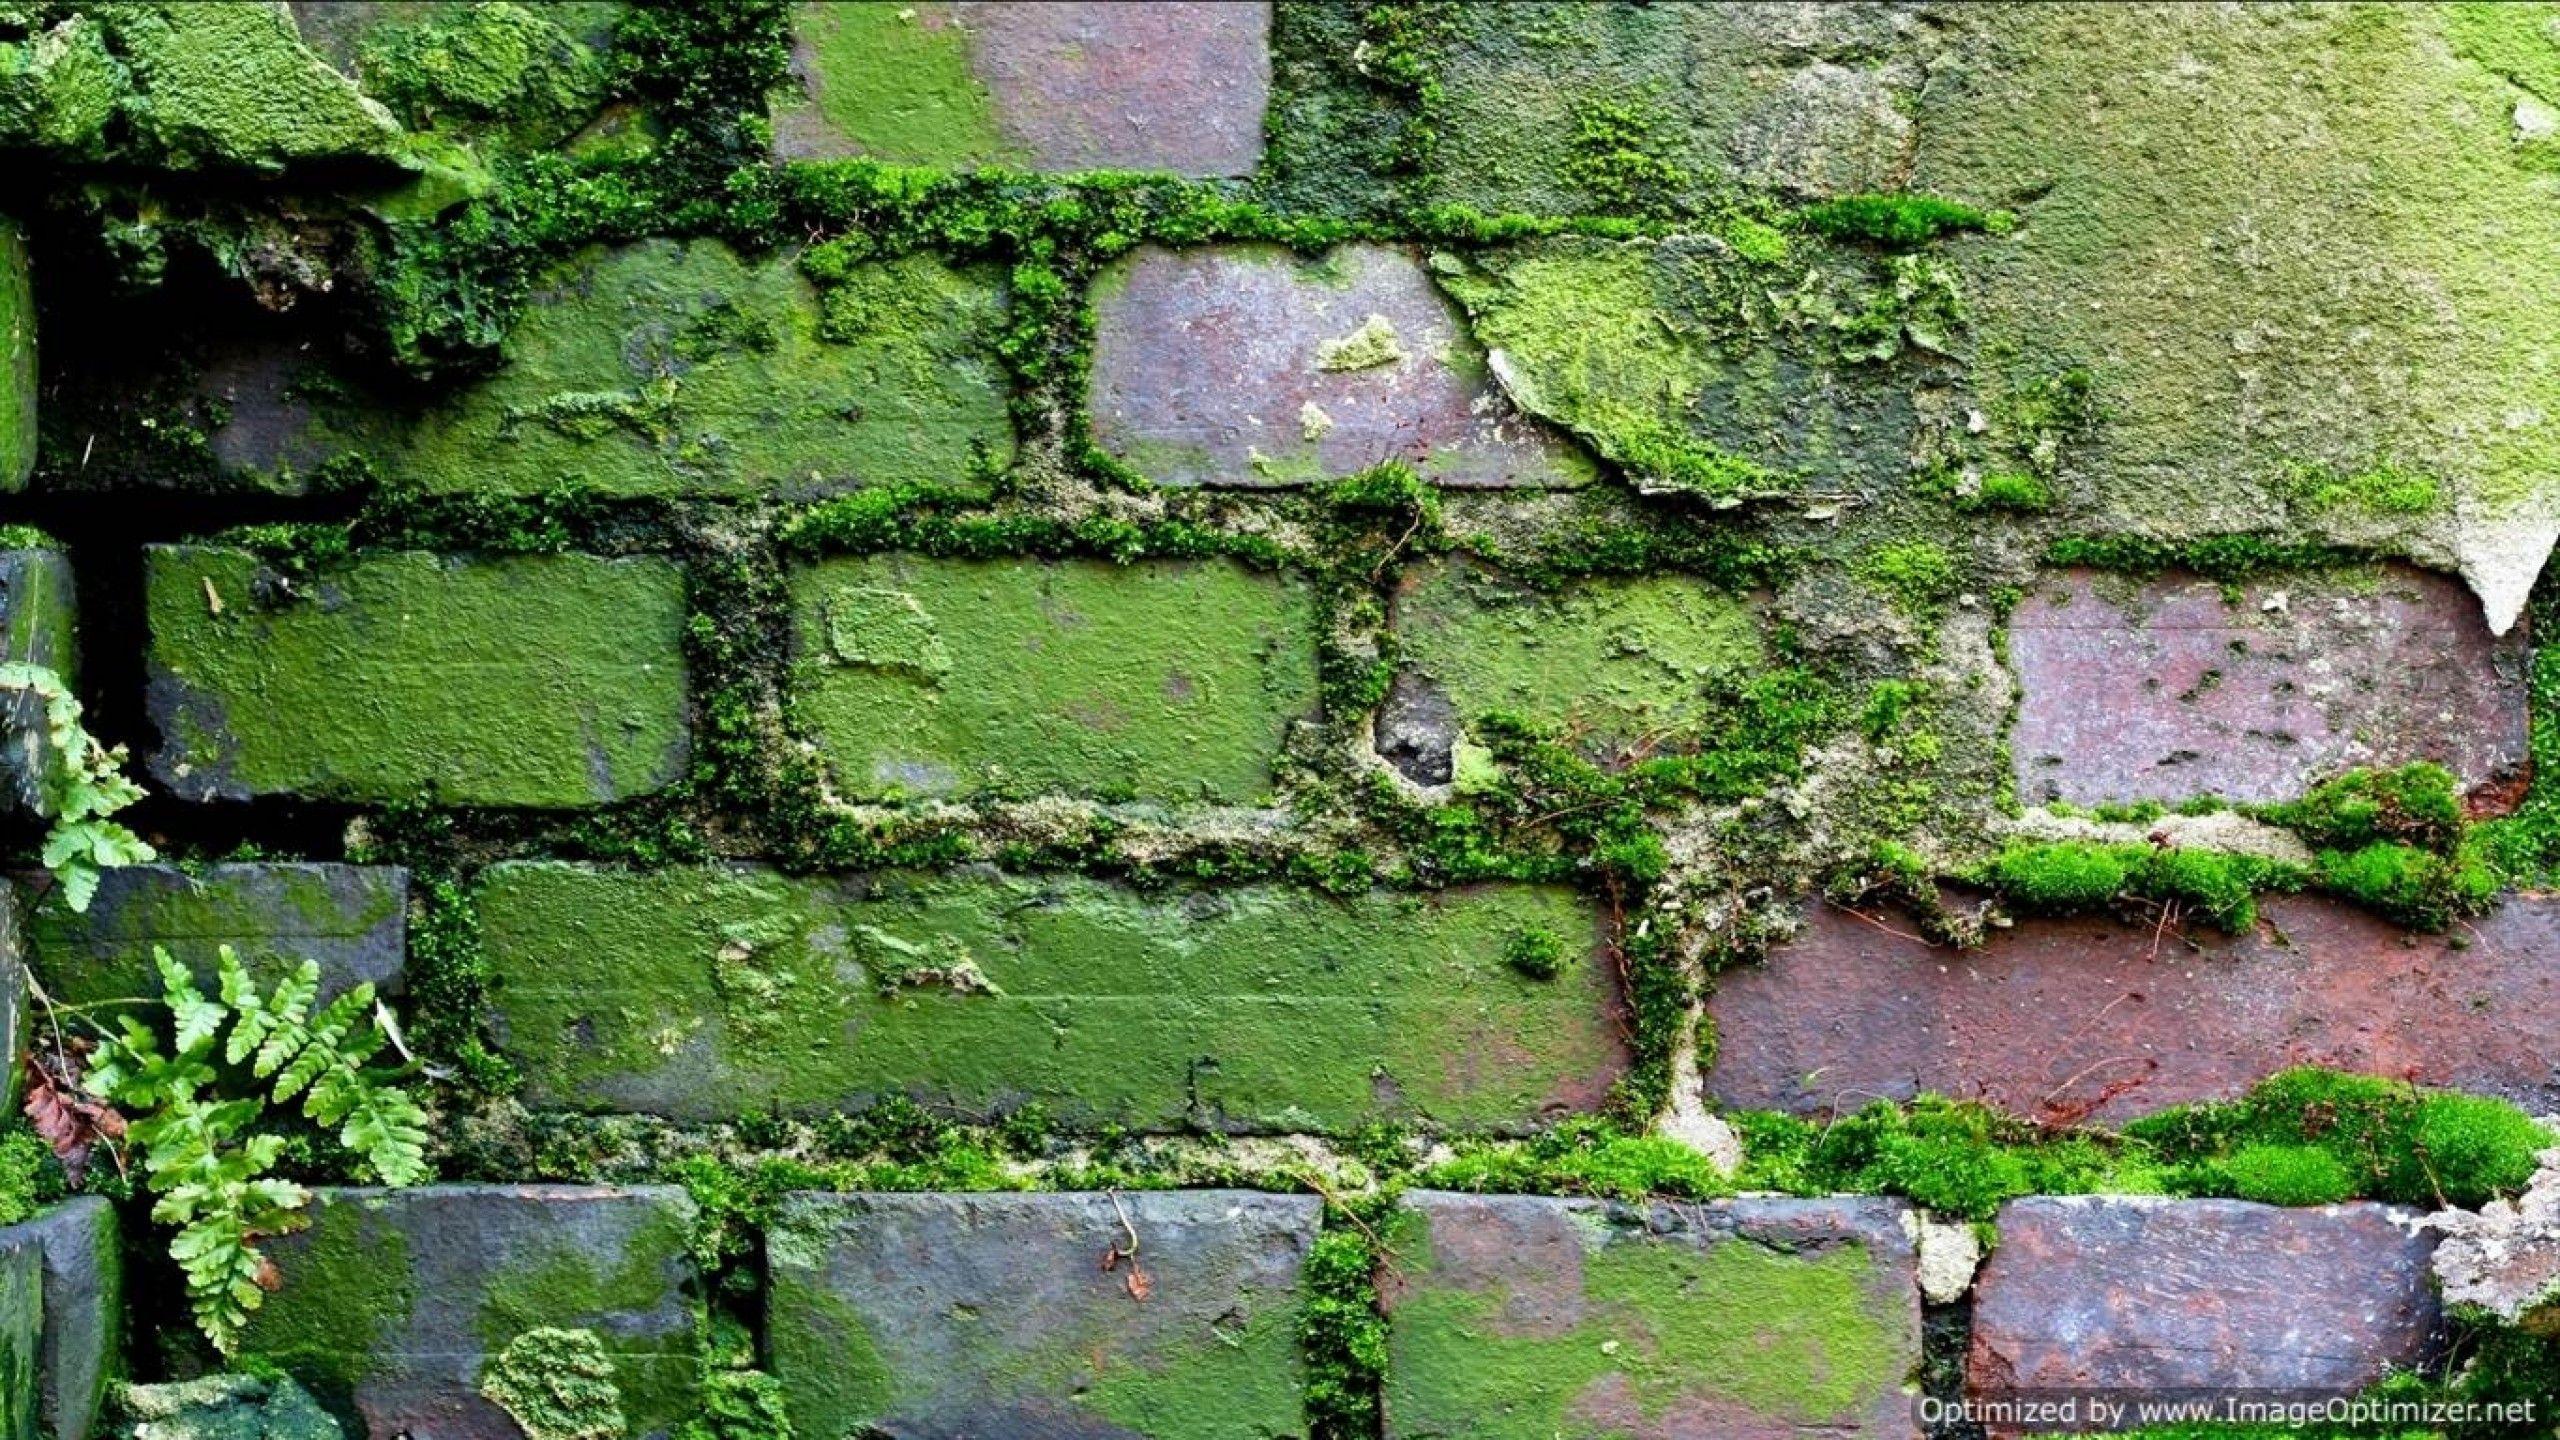 Moss Brush Photoshop wallpaper | palace castle | Pinterest ...